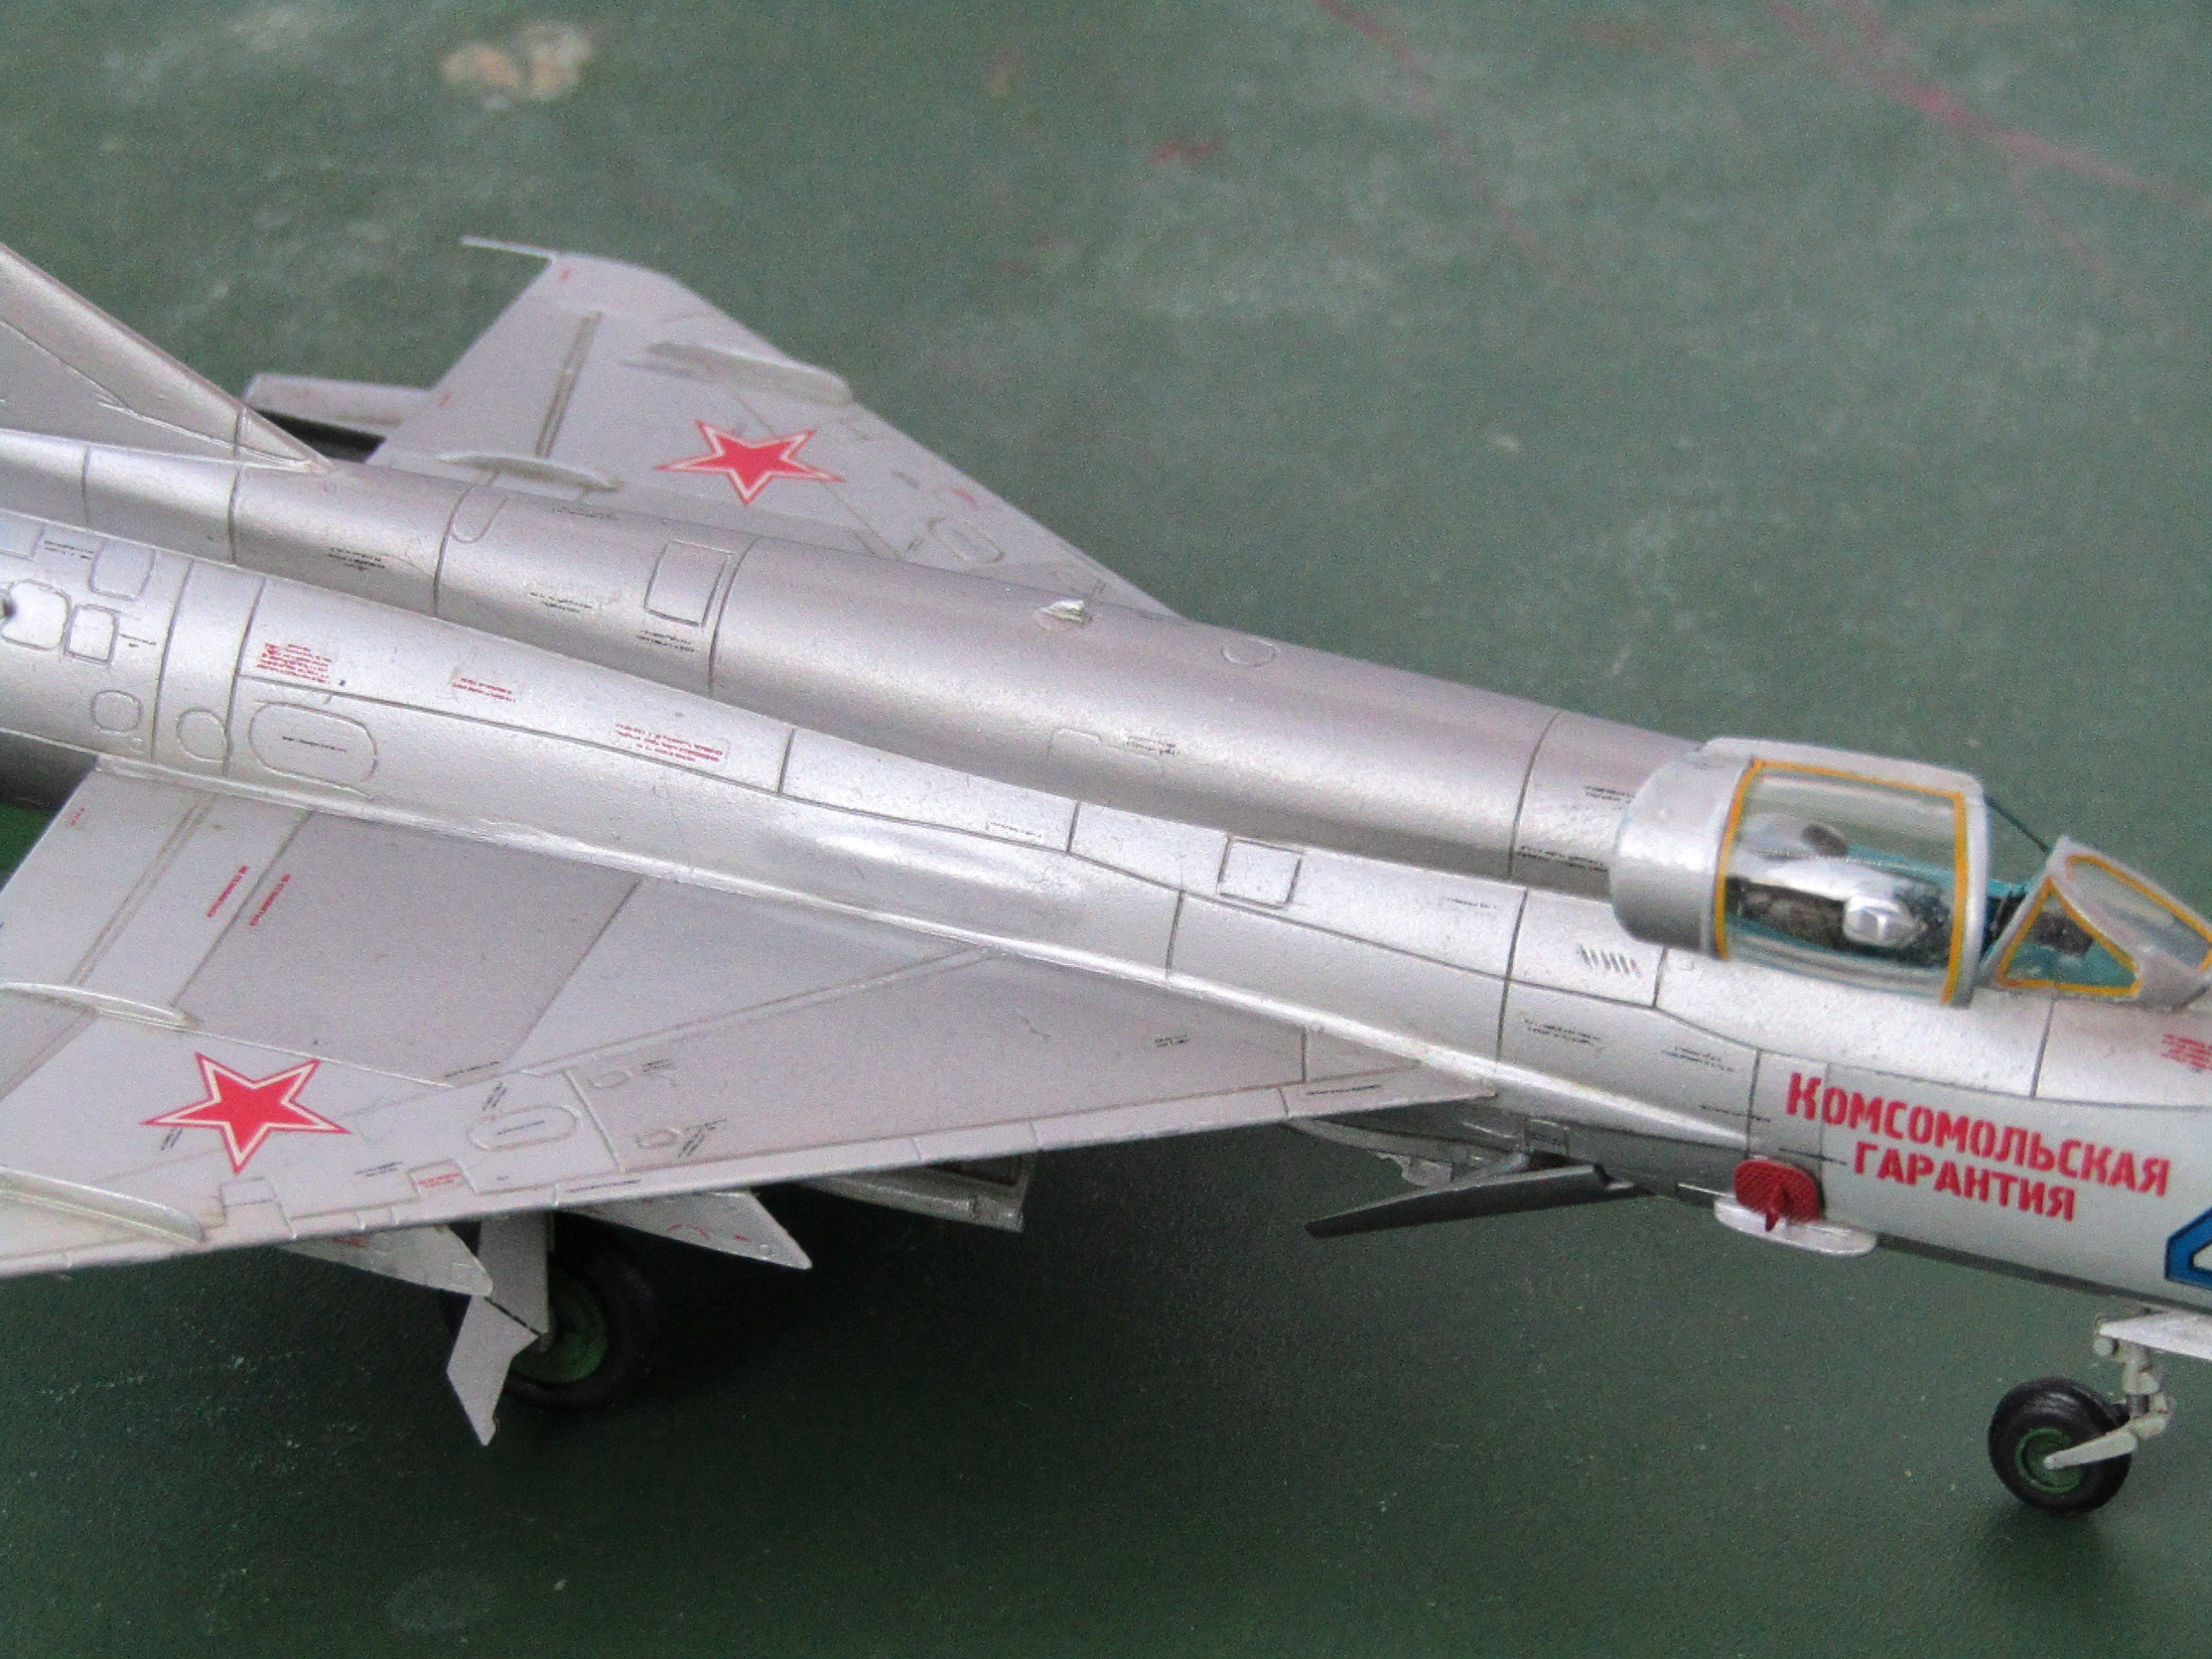 МиГ-21БИС 1/72 (Звезда) JXglVc1p9Ho